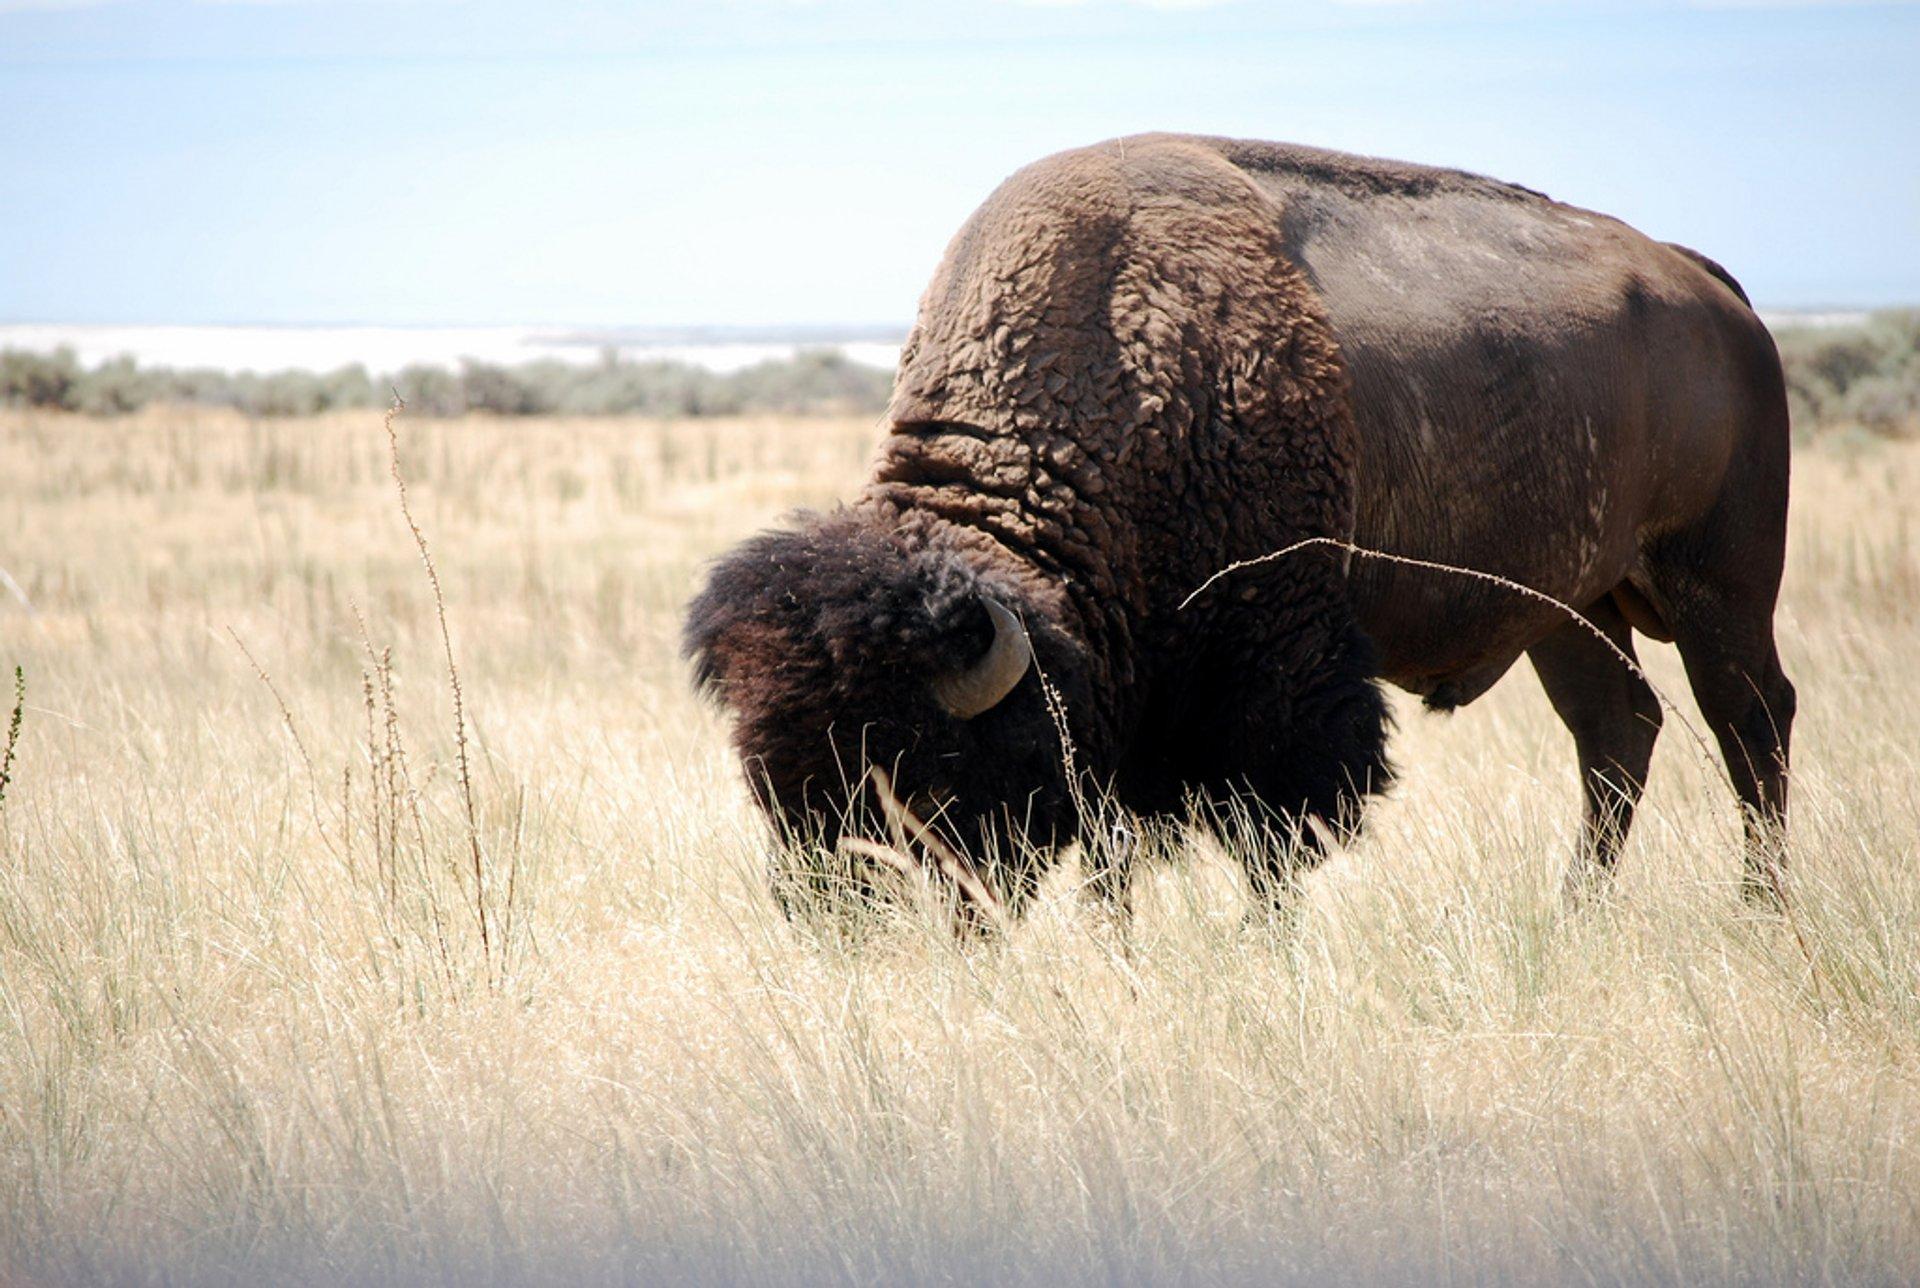 Grazing Buffalo, Antelope Island, Utah 2020